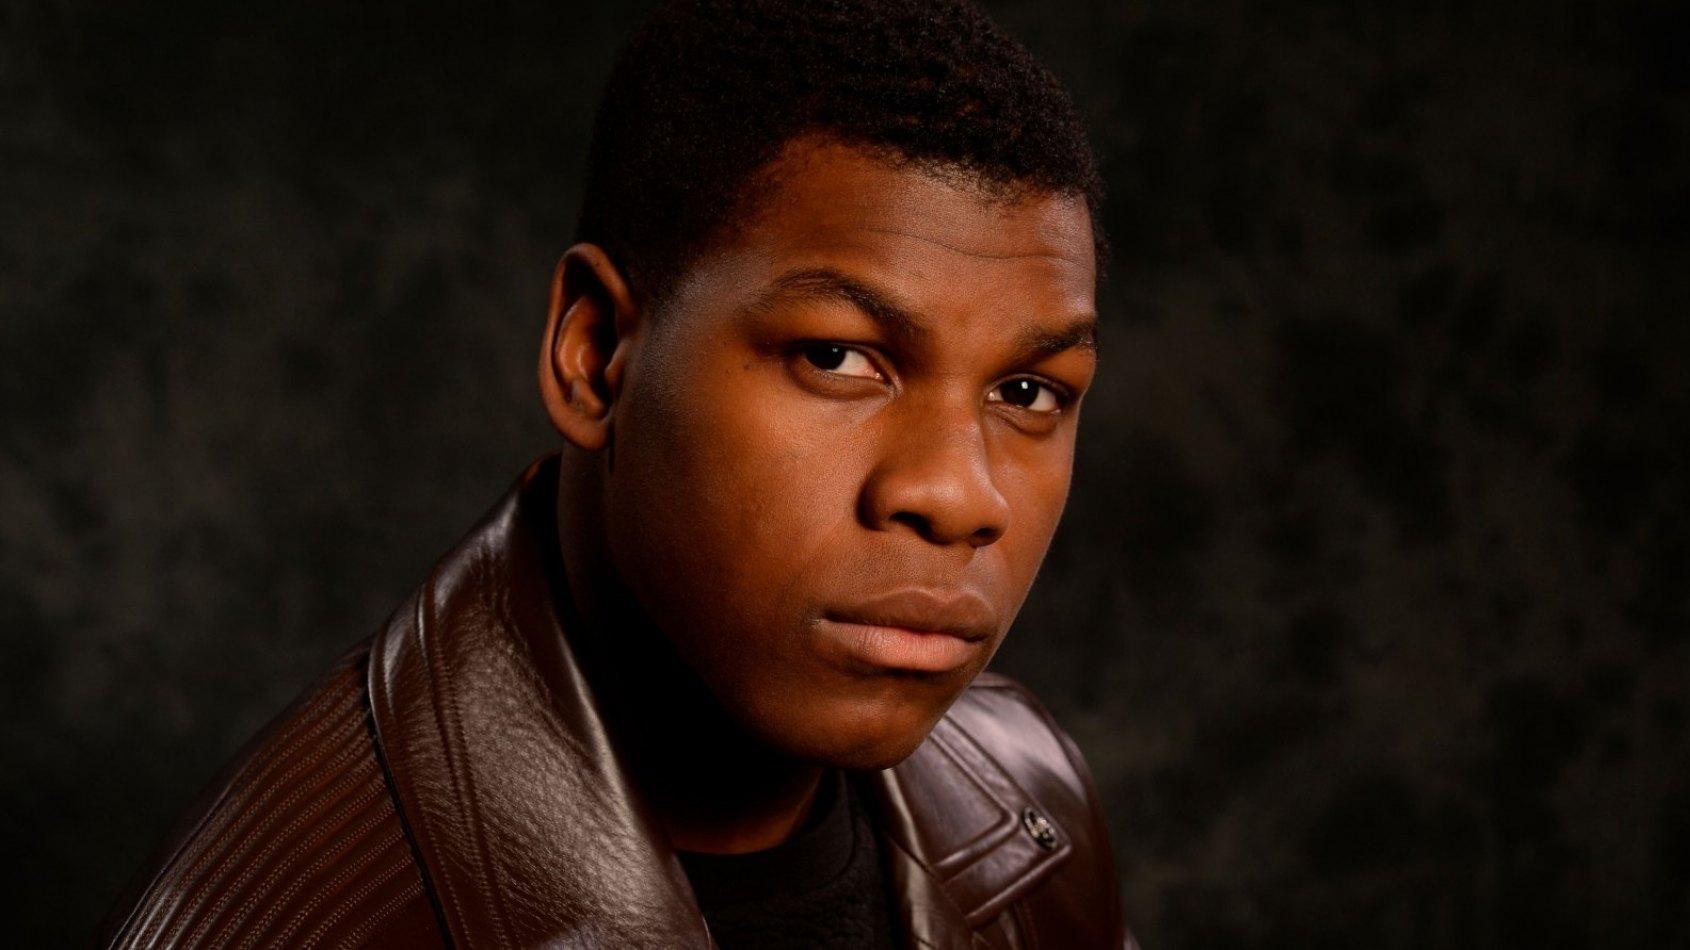 John Boyega nous dit que Star Wars Episode VIII sera plus sombre